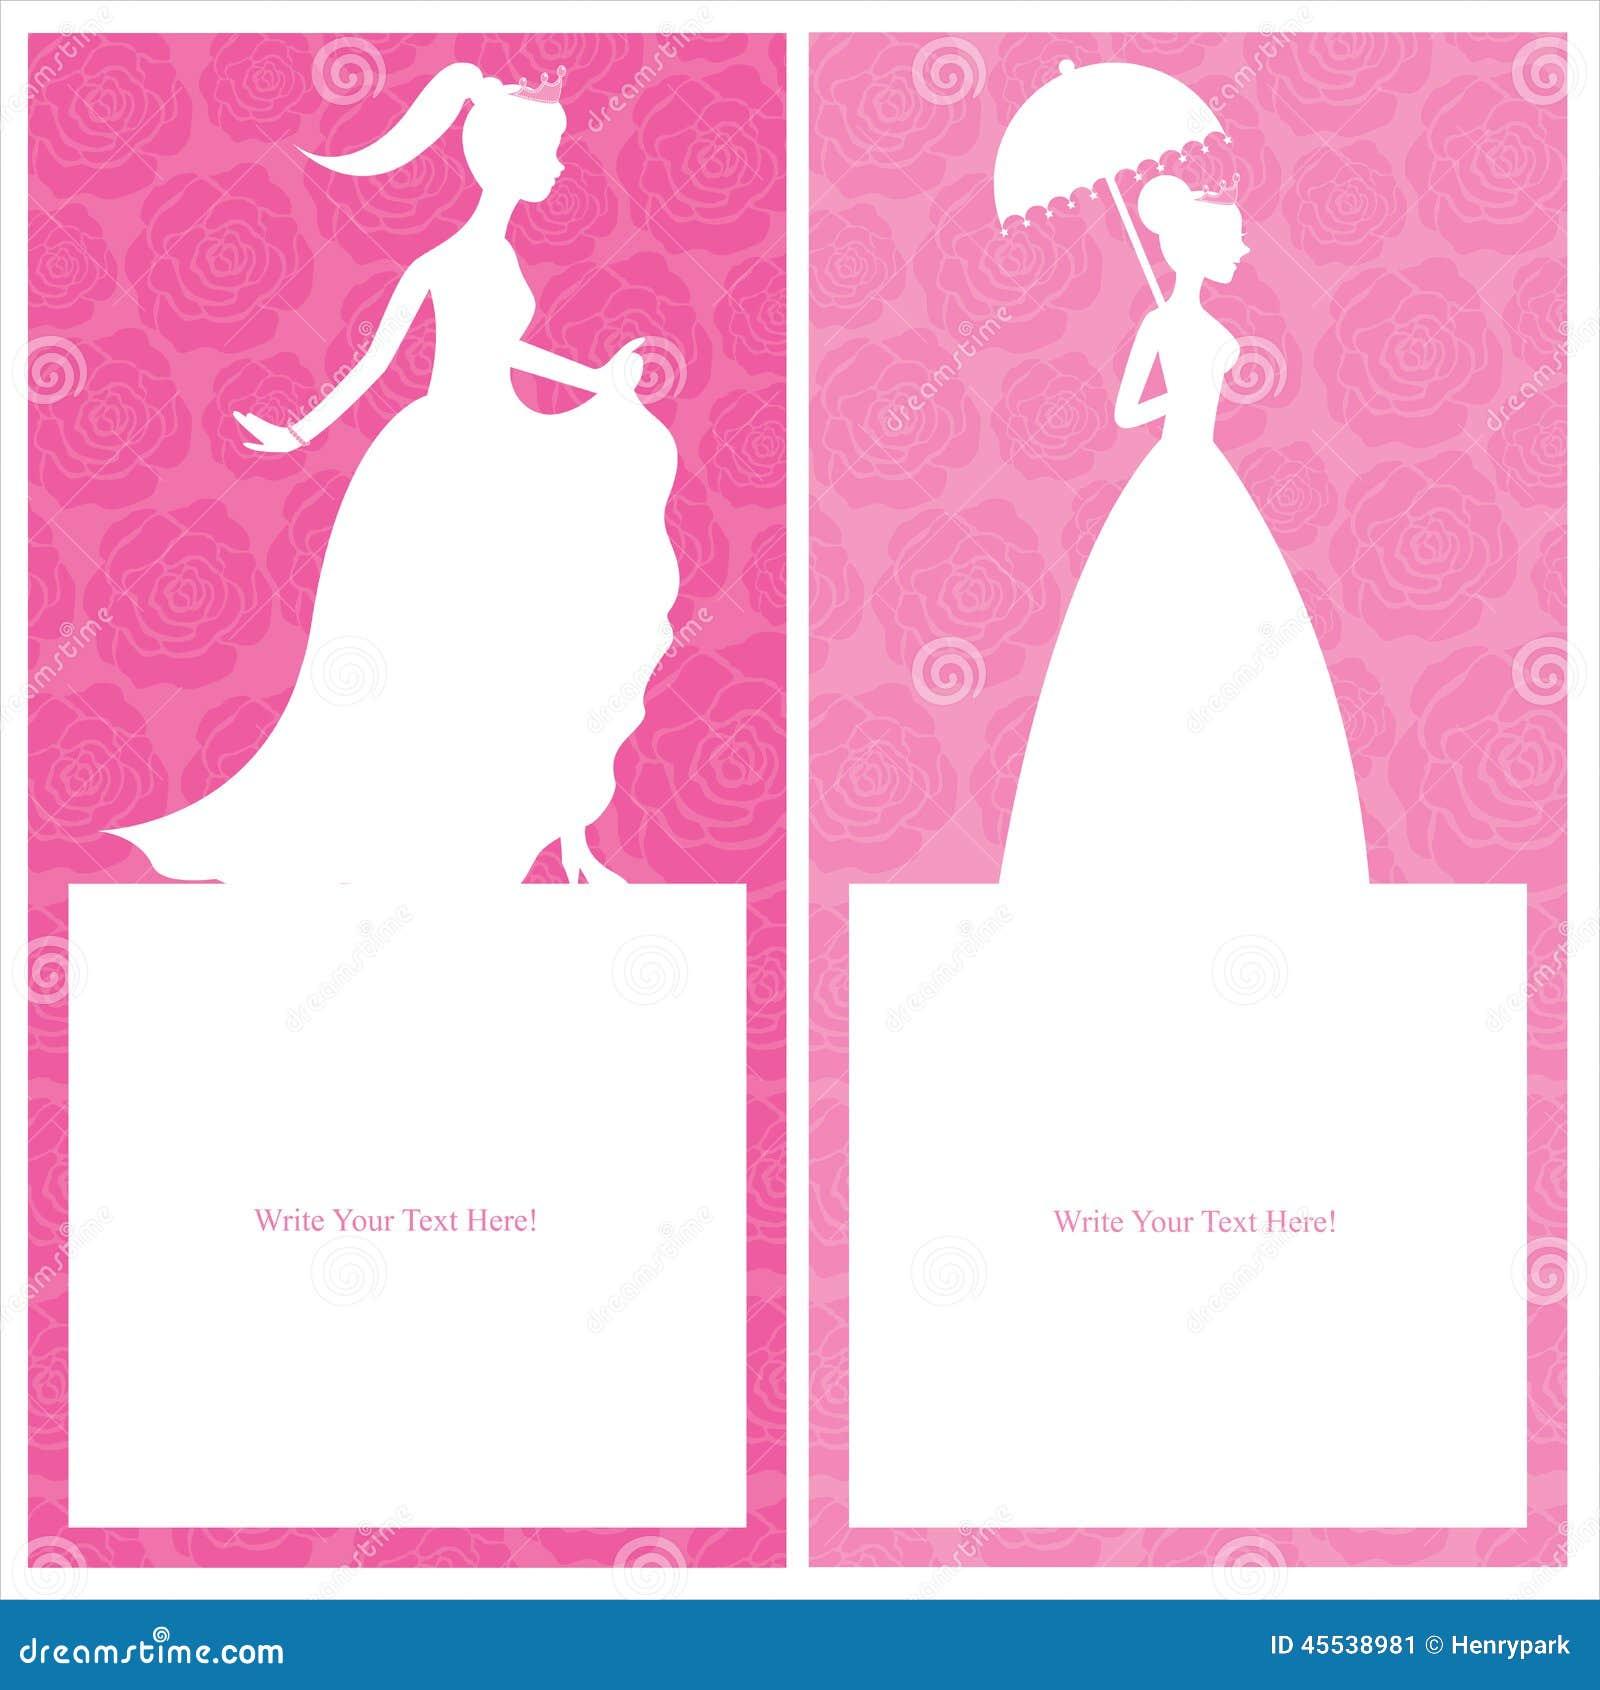 princess template card design stock vector image  princess template card design